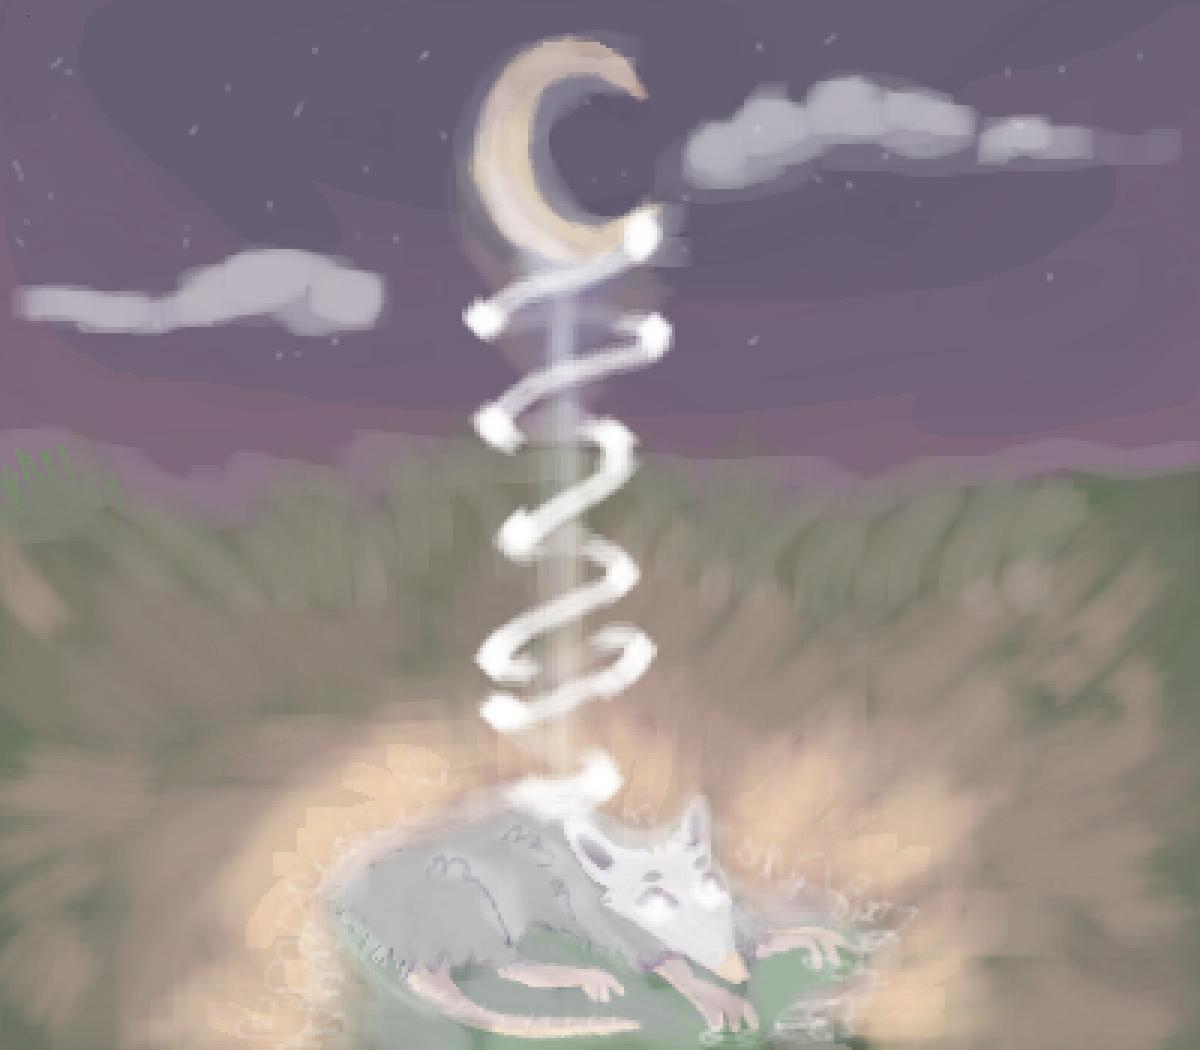 Lord Possum